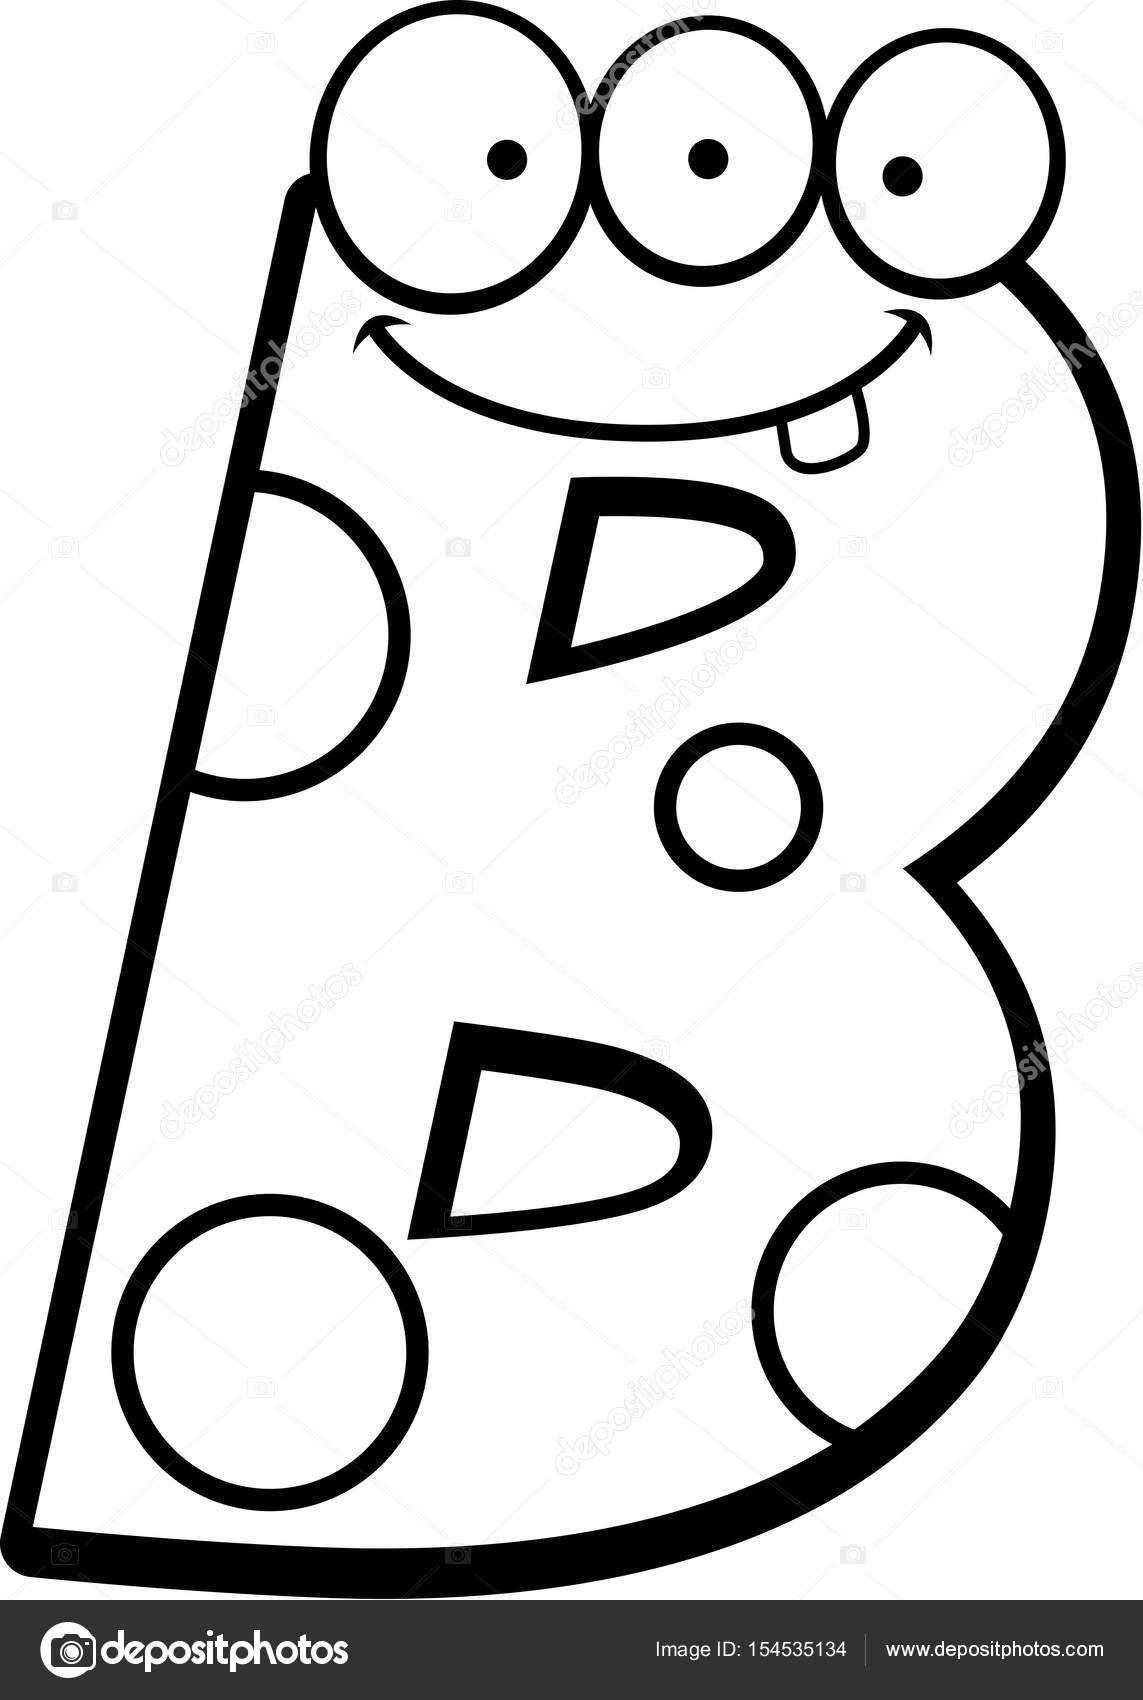 Litera B Potwora Grafika Wektorowa Cthoman 154535134